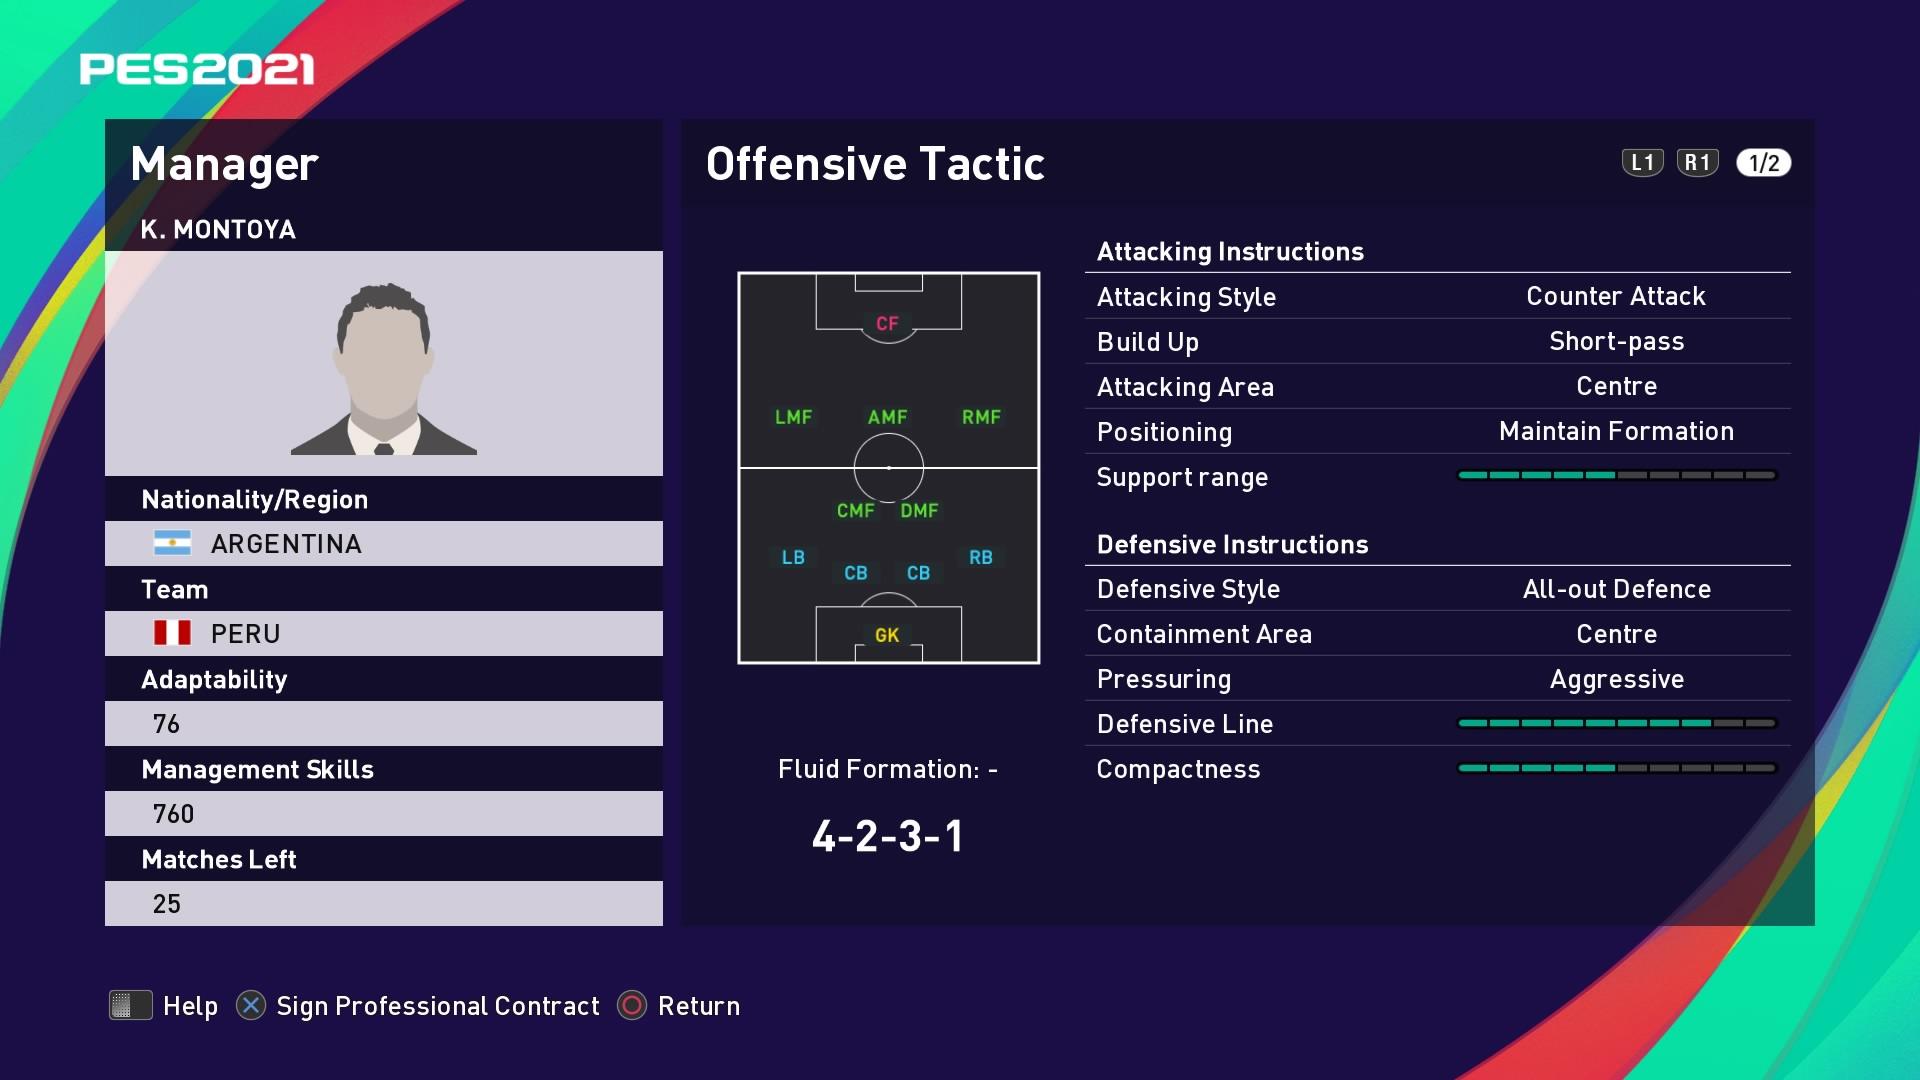 K. Montoya (Ricardo Gareca) Offensive Tactic in PES 2021 myClub